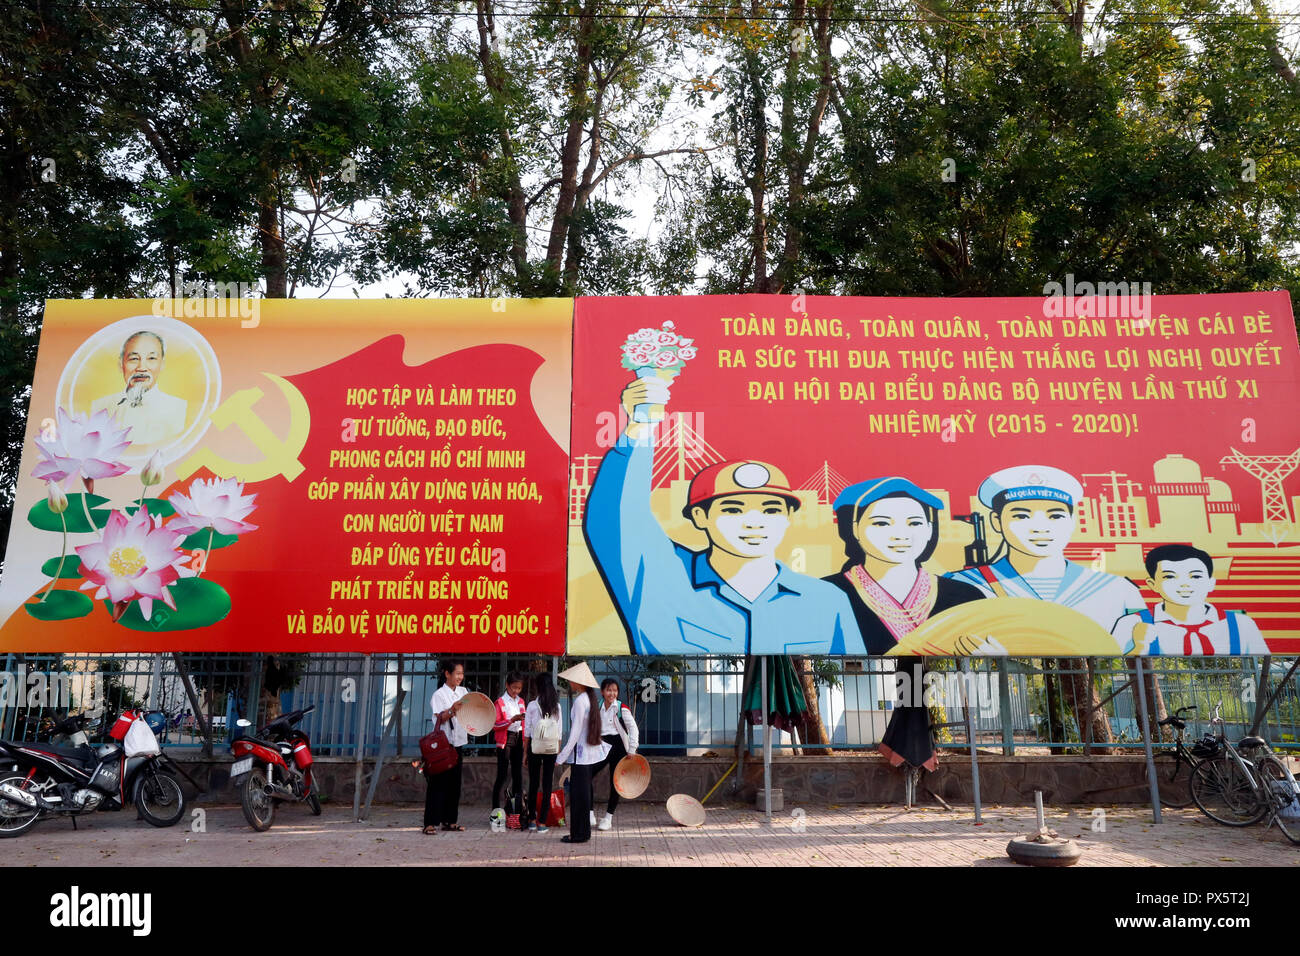 Communist government propaganda poster in the street. Cai Be. Vietnam. - Stock Image